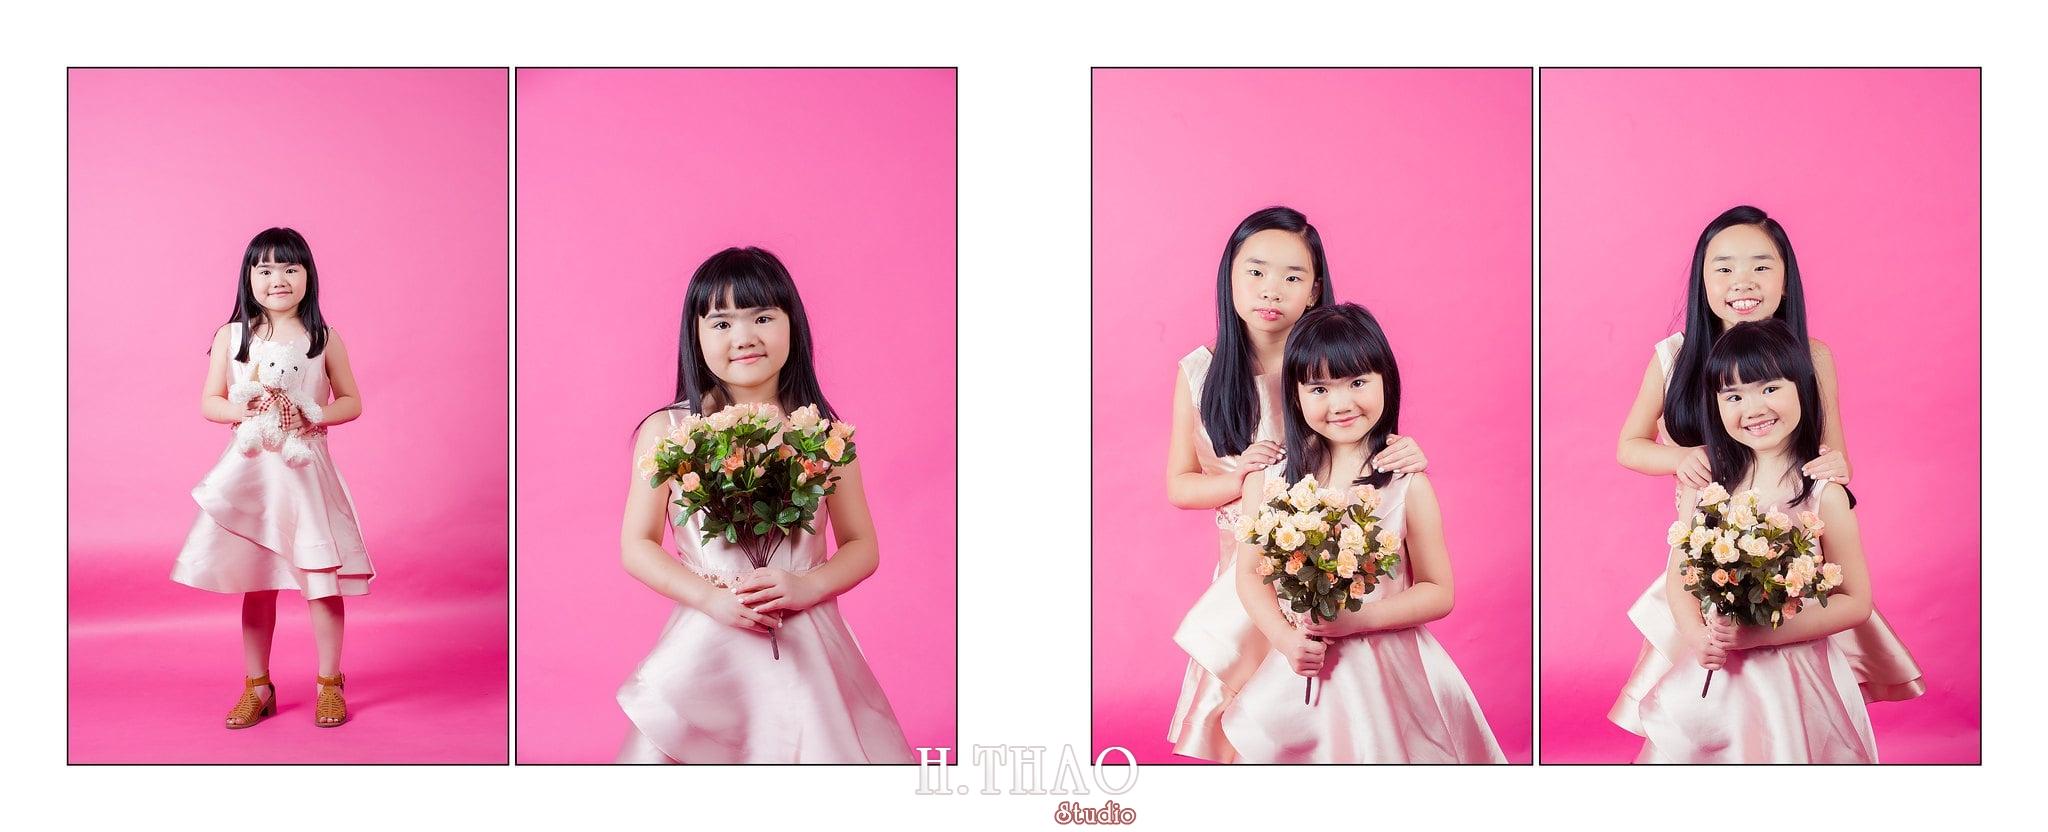 Anh gia dinh Jenny Nguyen 10 - Album ảnh gia đình chị Jenny Nguyễn - HThao Studio